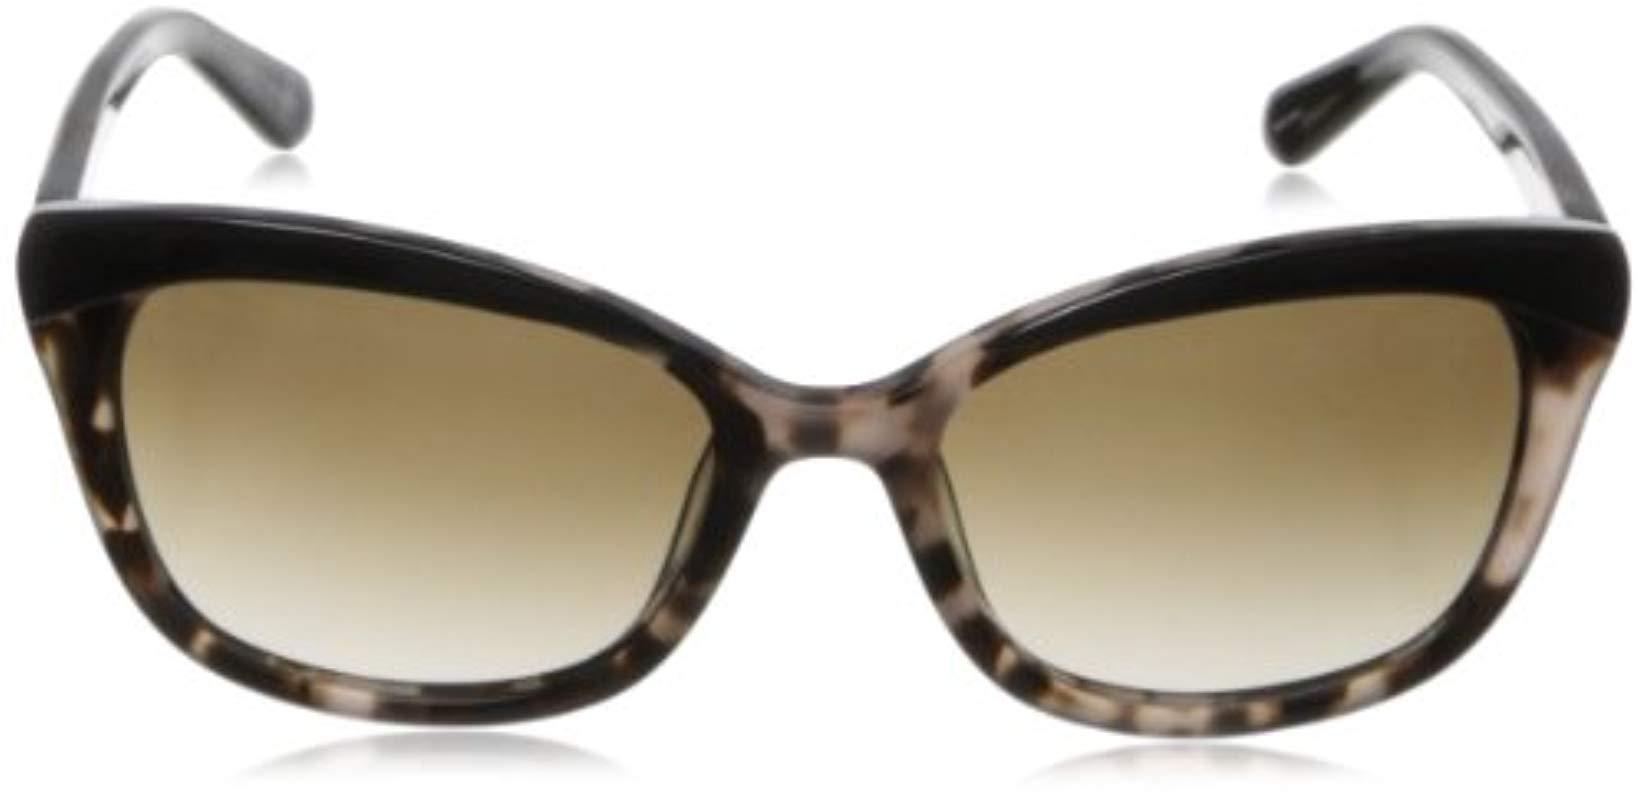 e62c4474d2 Kate Spade - Black Amara Cat-eye Sunglasses - Lyst. View fullscreen